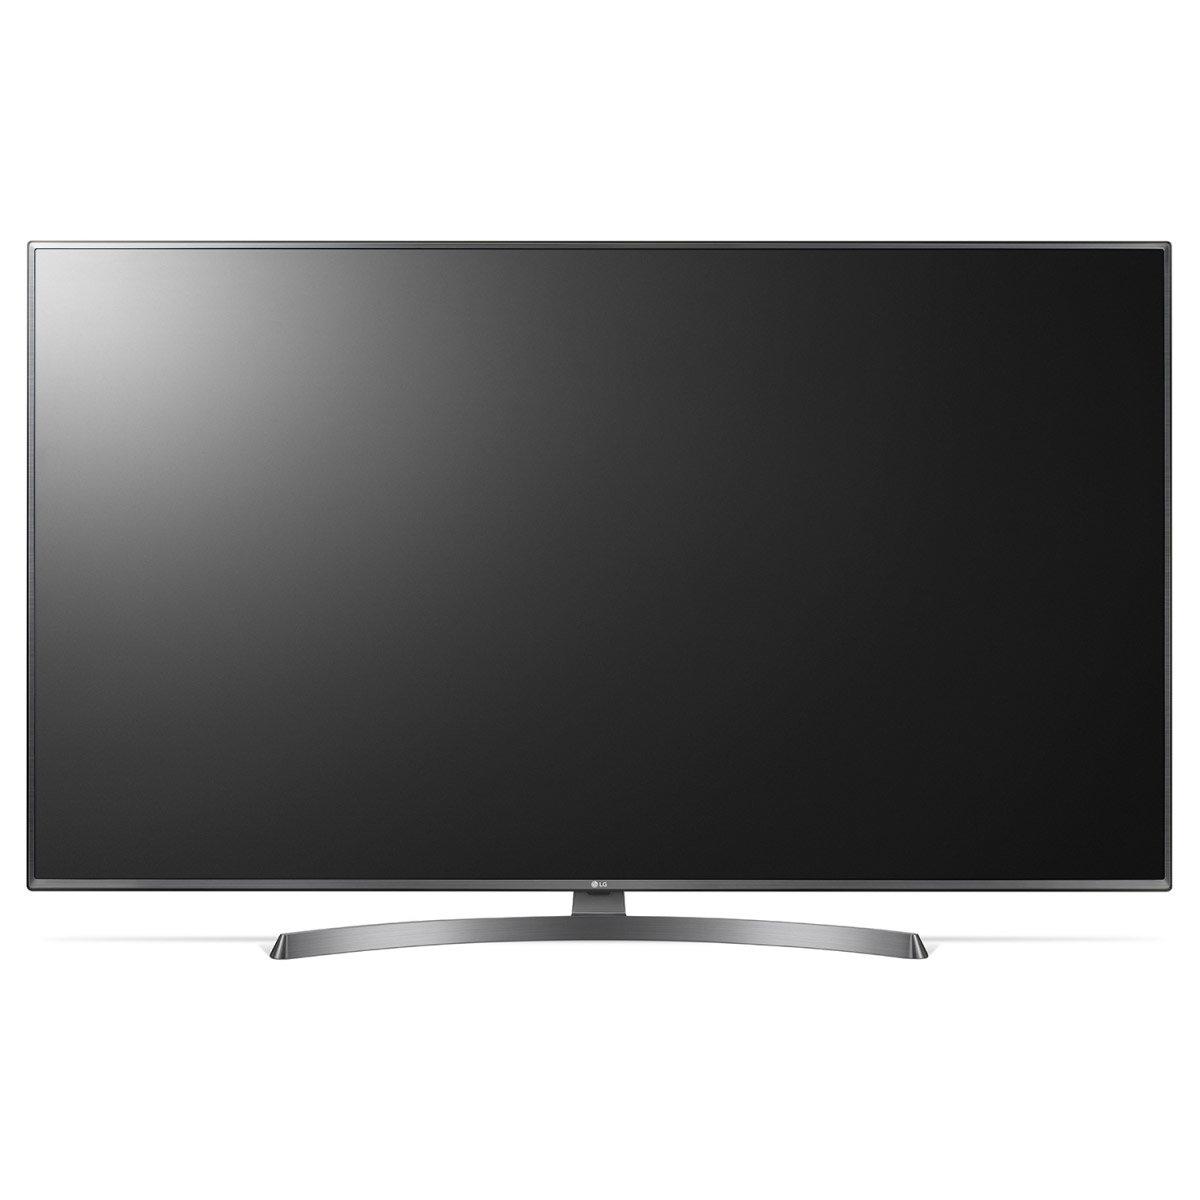 e6db4ac86 LG 50UK6540PTD 50 Inch 127cm Smart 4K UHD LED LCD TV